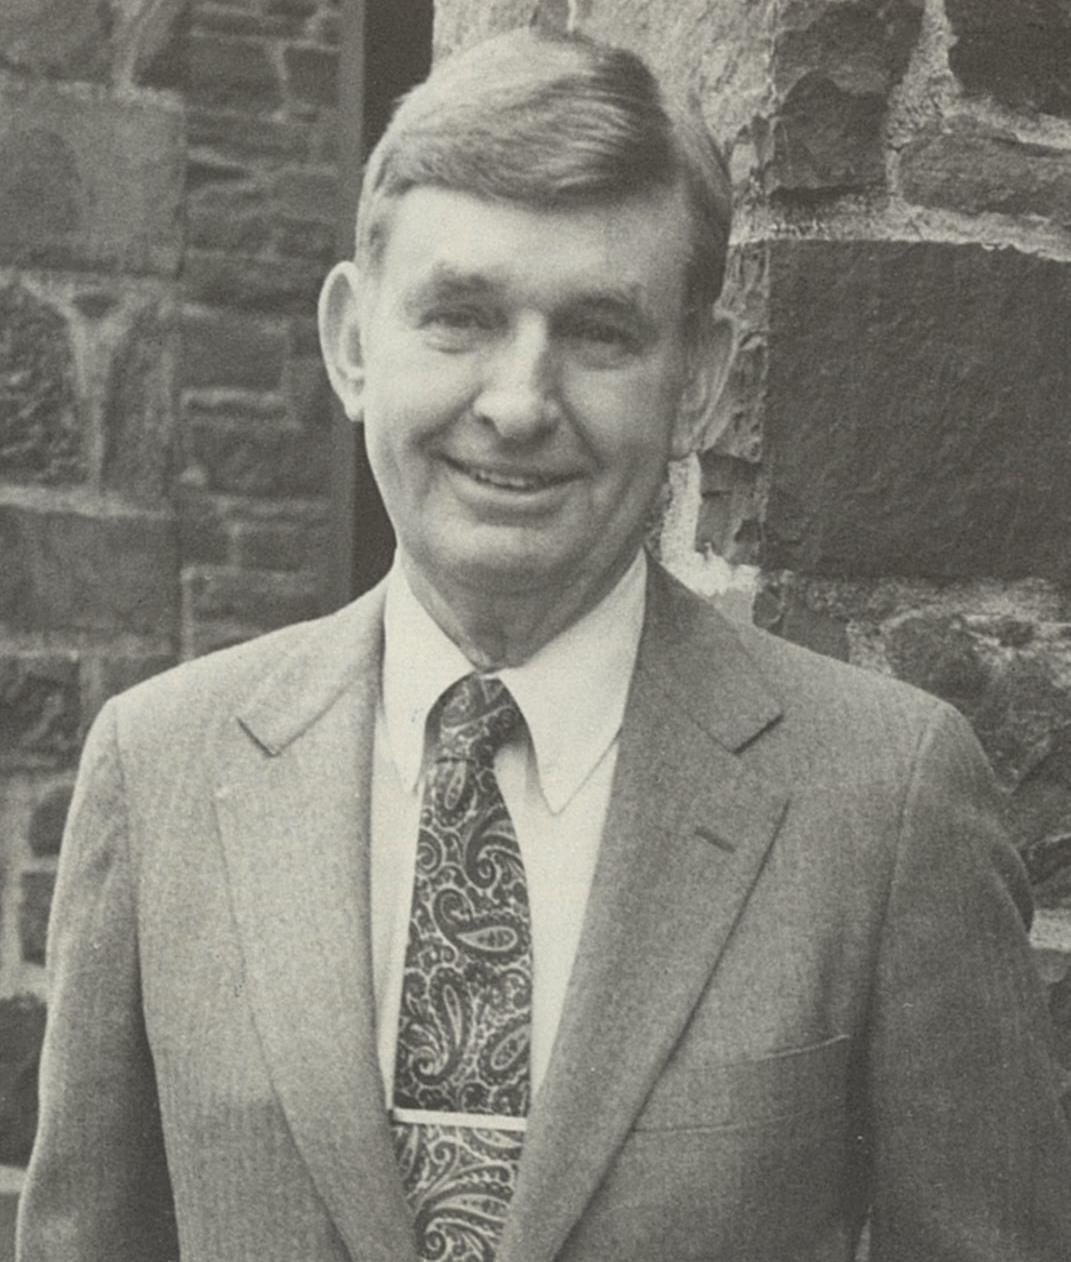 HENRY W. PFEIFFER